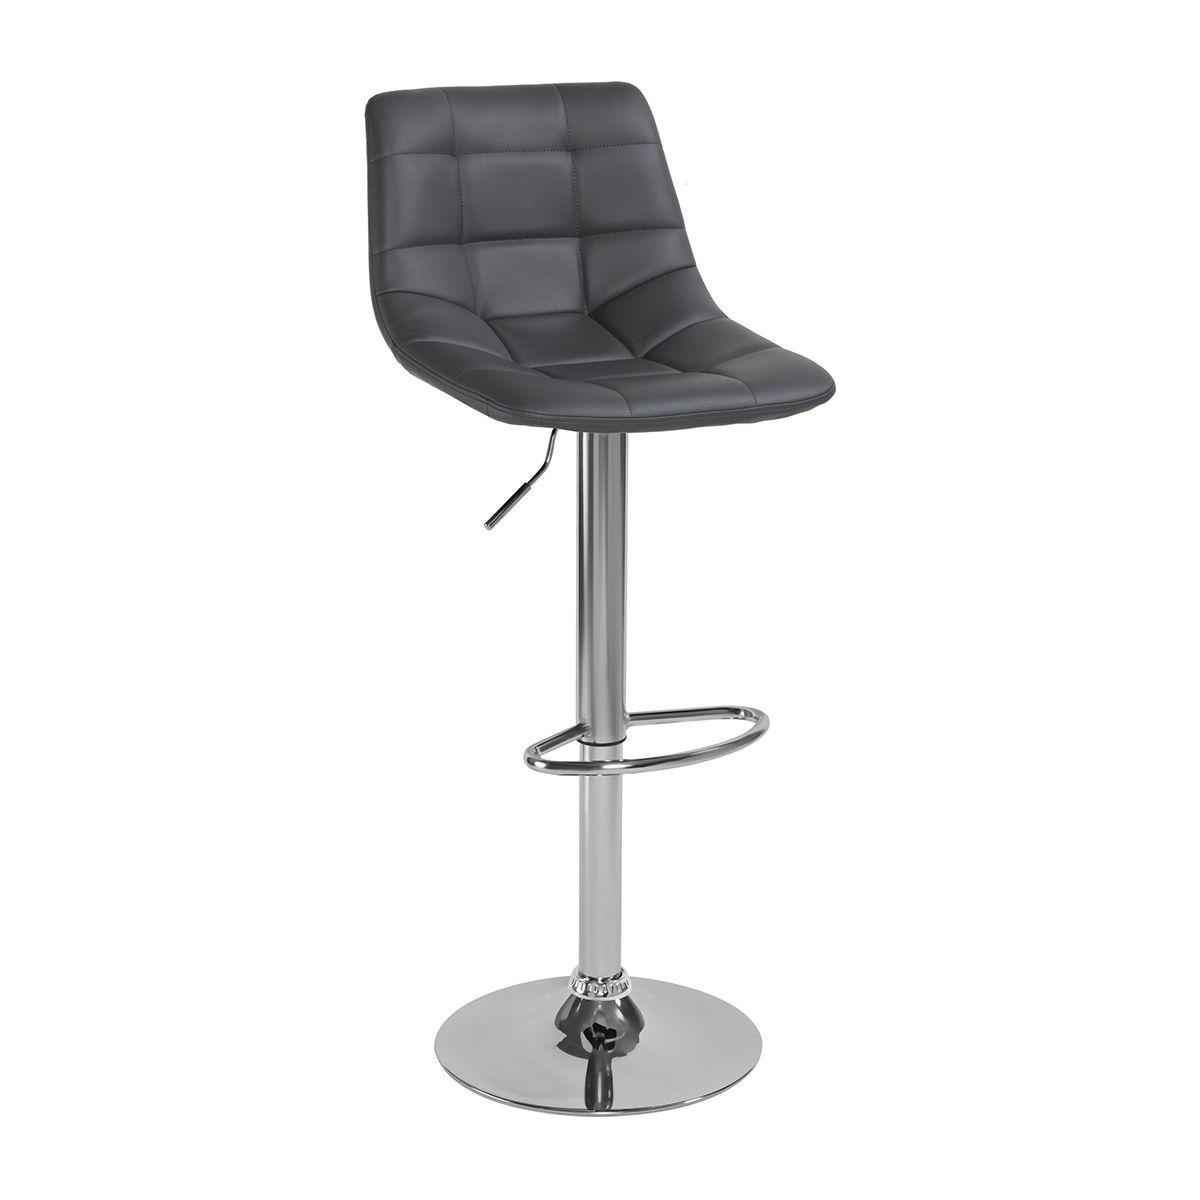 Барный стул Chianti серыйБарные стулья<br><br>